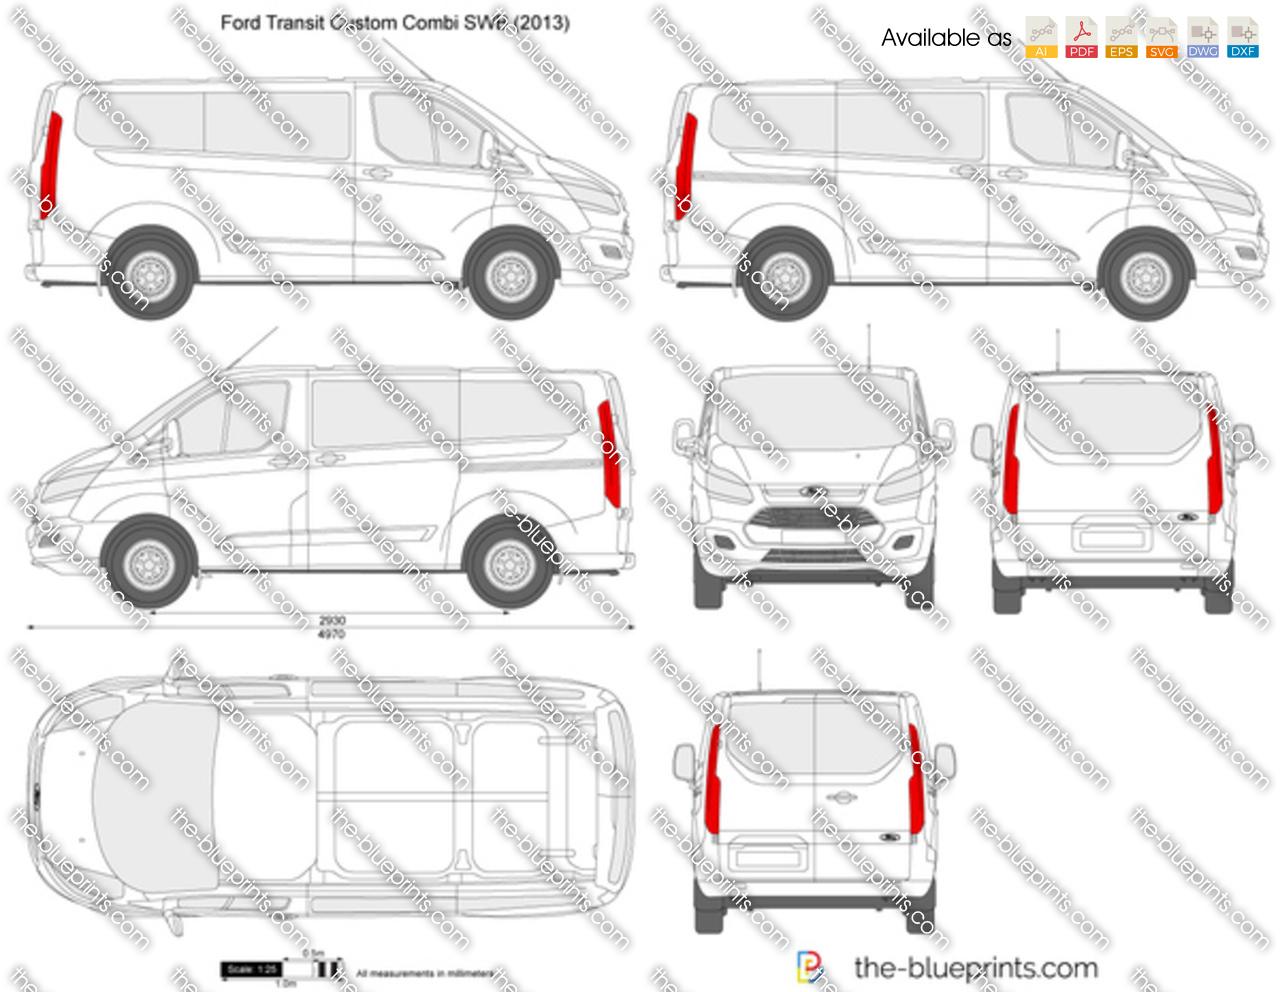 Ford Transit Custom Combi SWB 2014